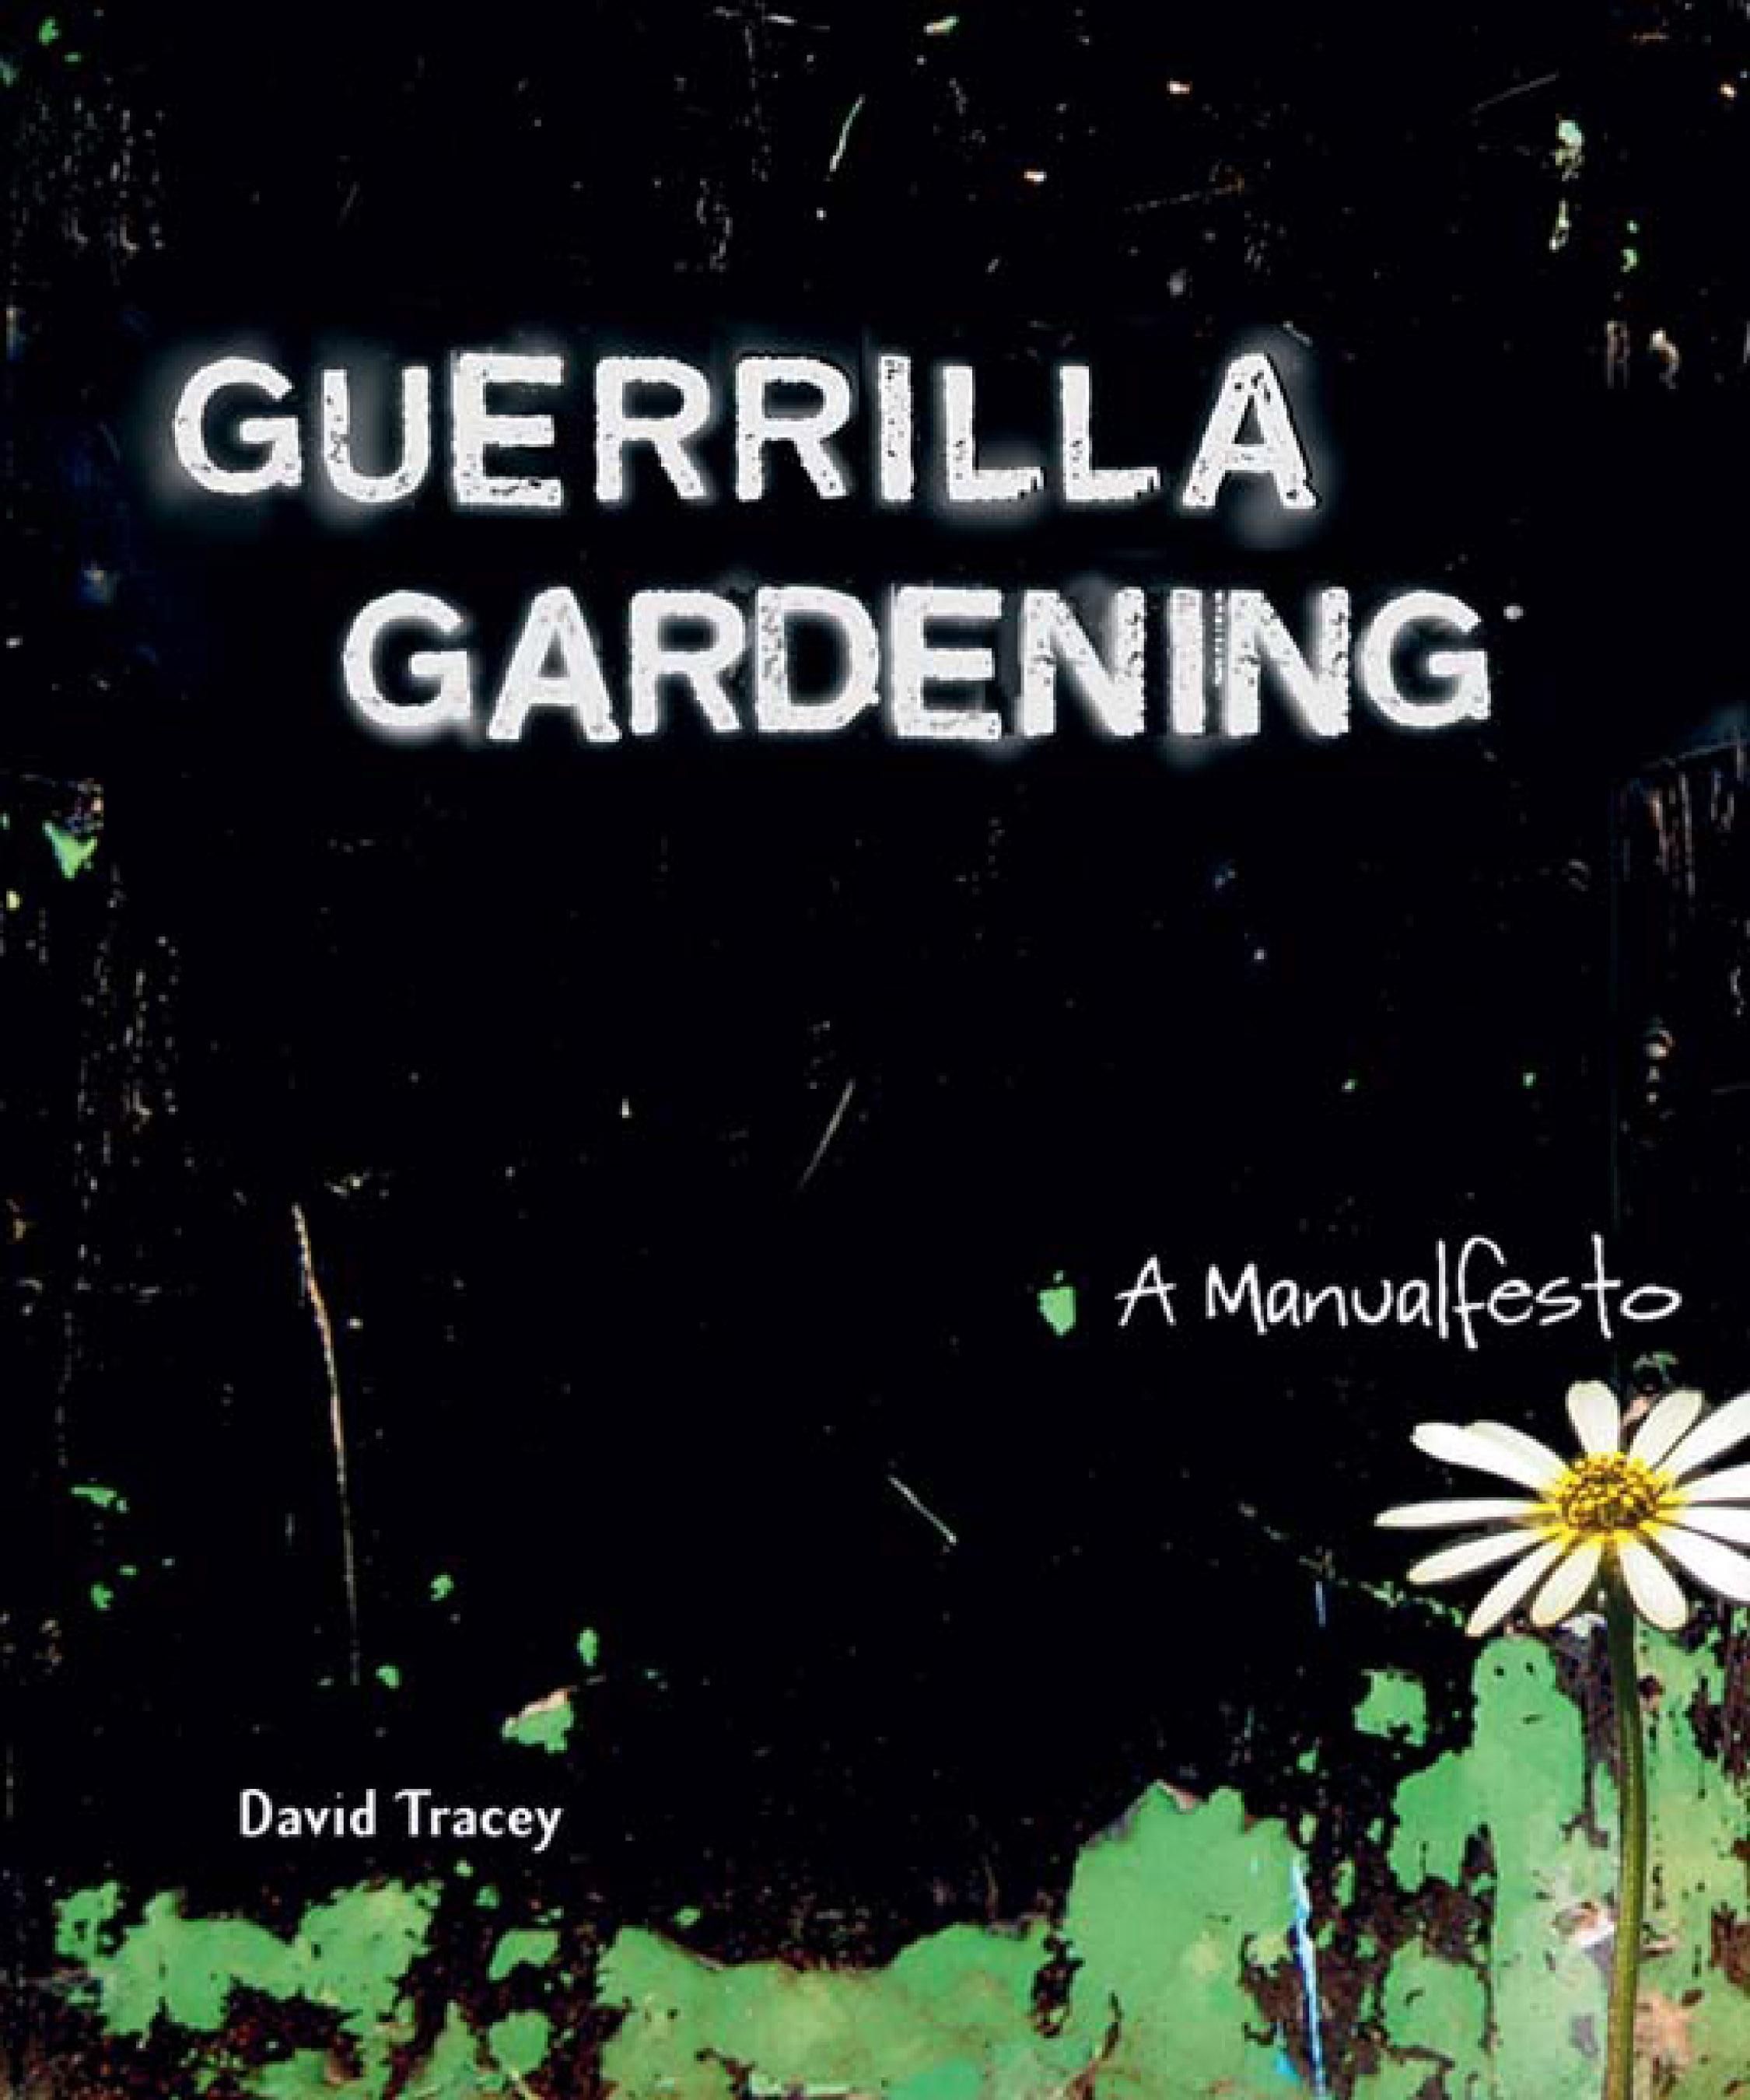 Guerrilla Gardening: A Manualfesto EB9781550923896